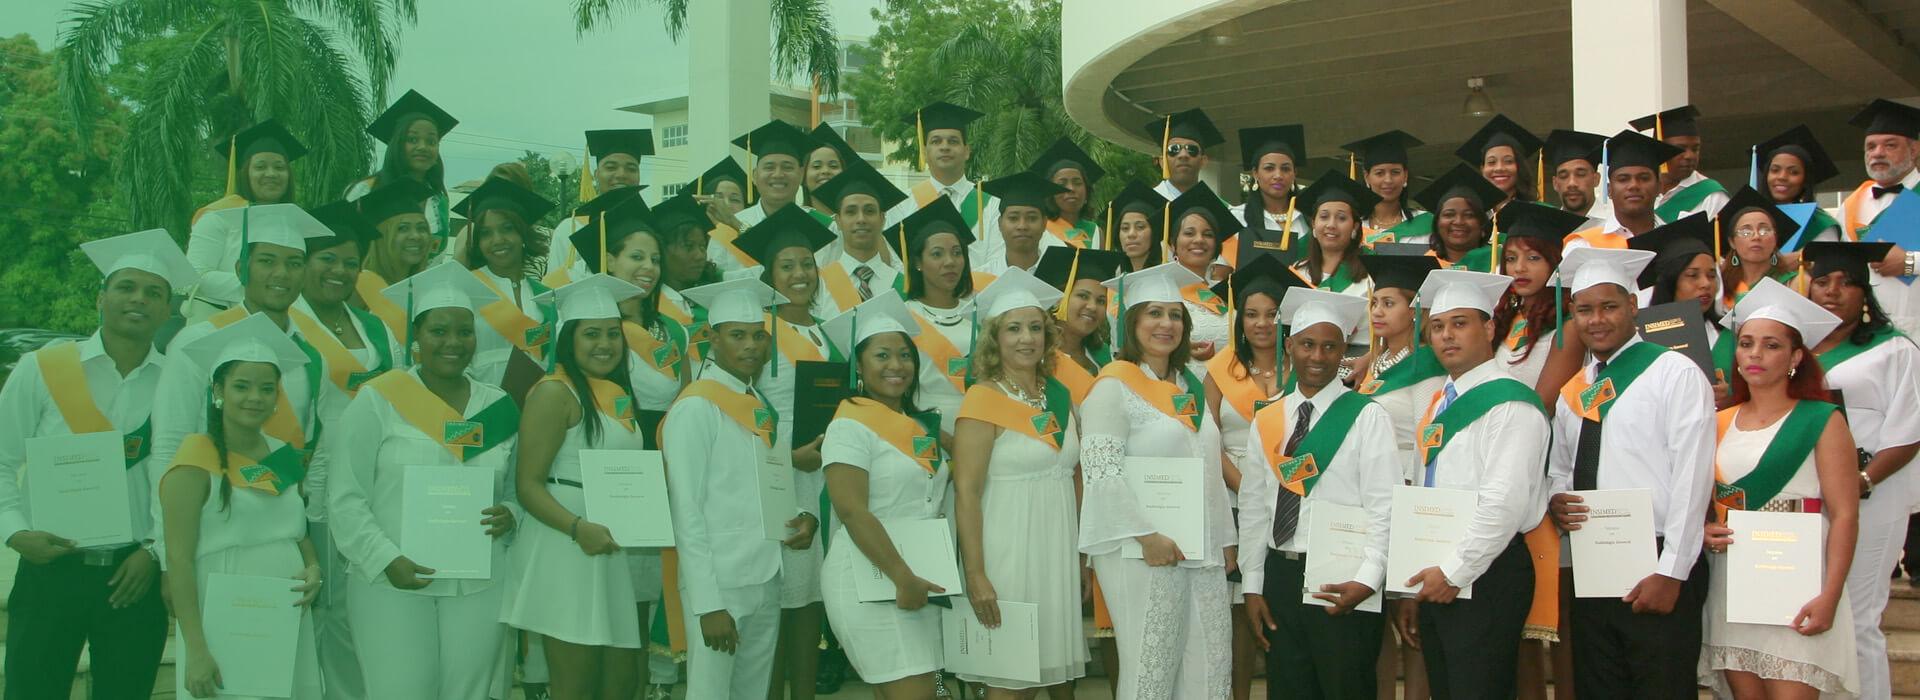 Insimed graduados